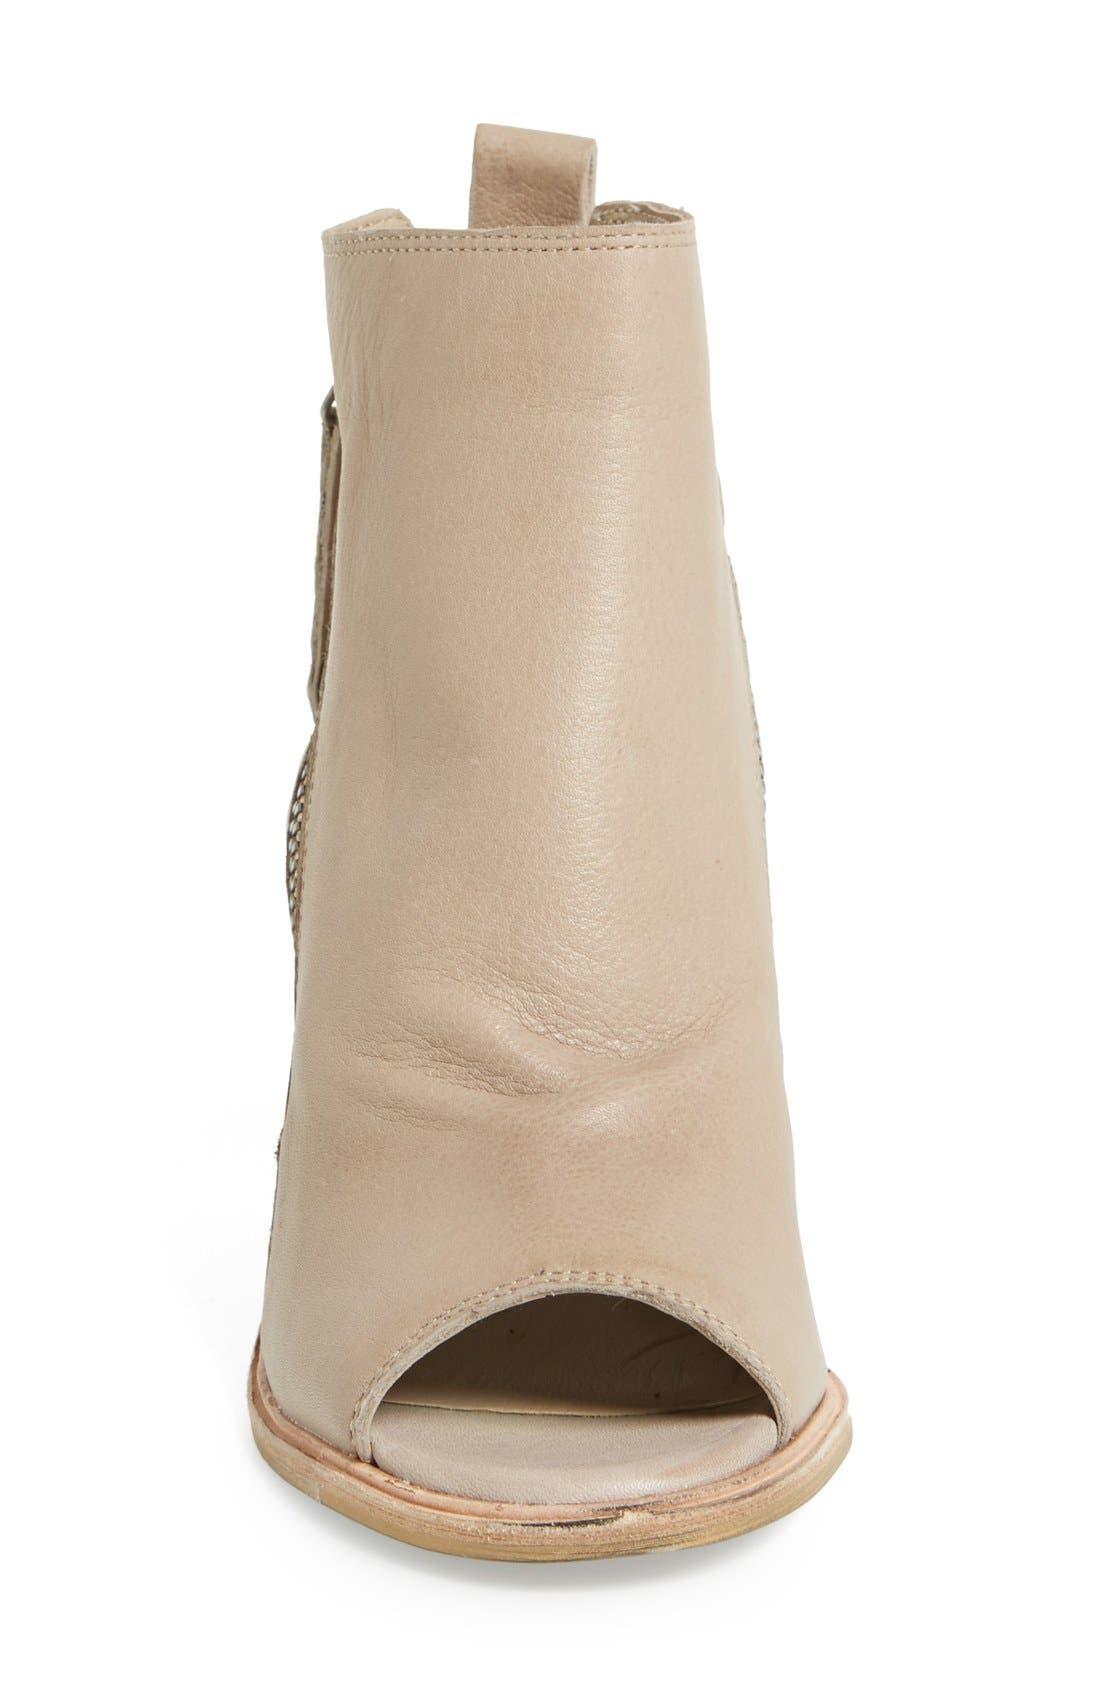 'Port' Open Toe Bootie,                             Alternate thumbnail 3, color,                             Almond Leather